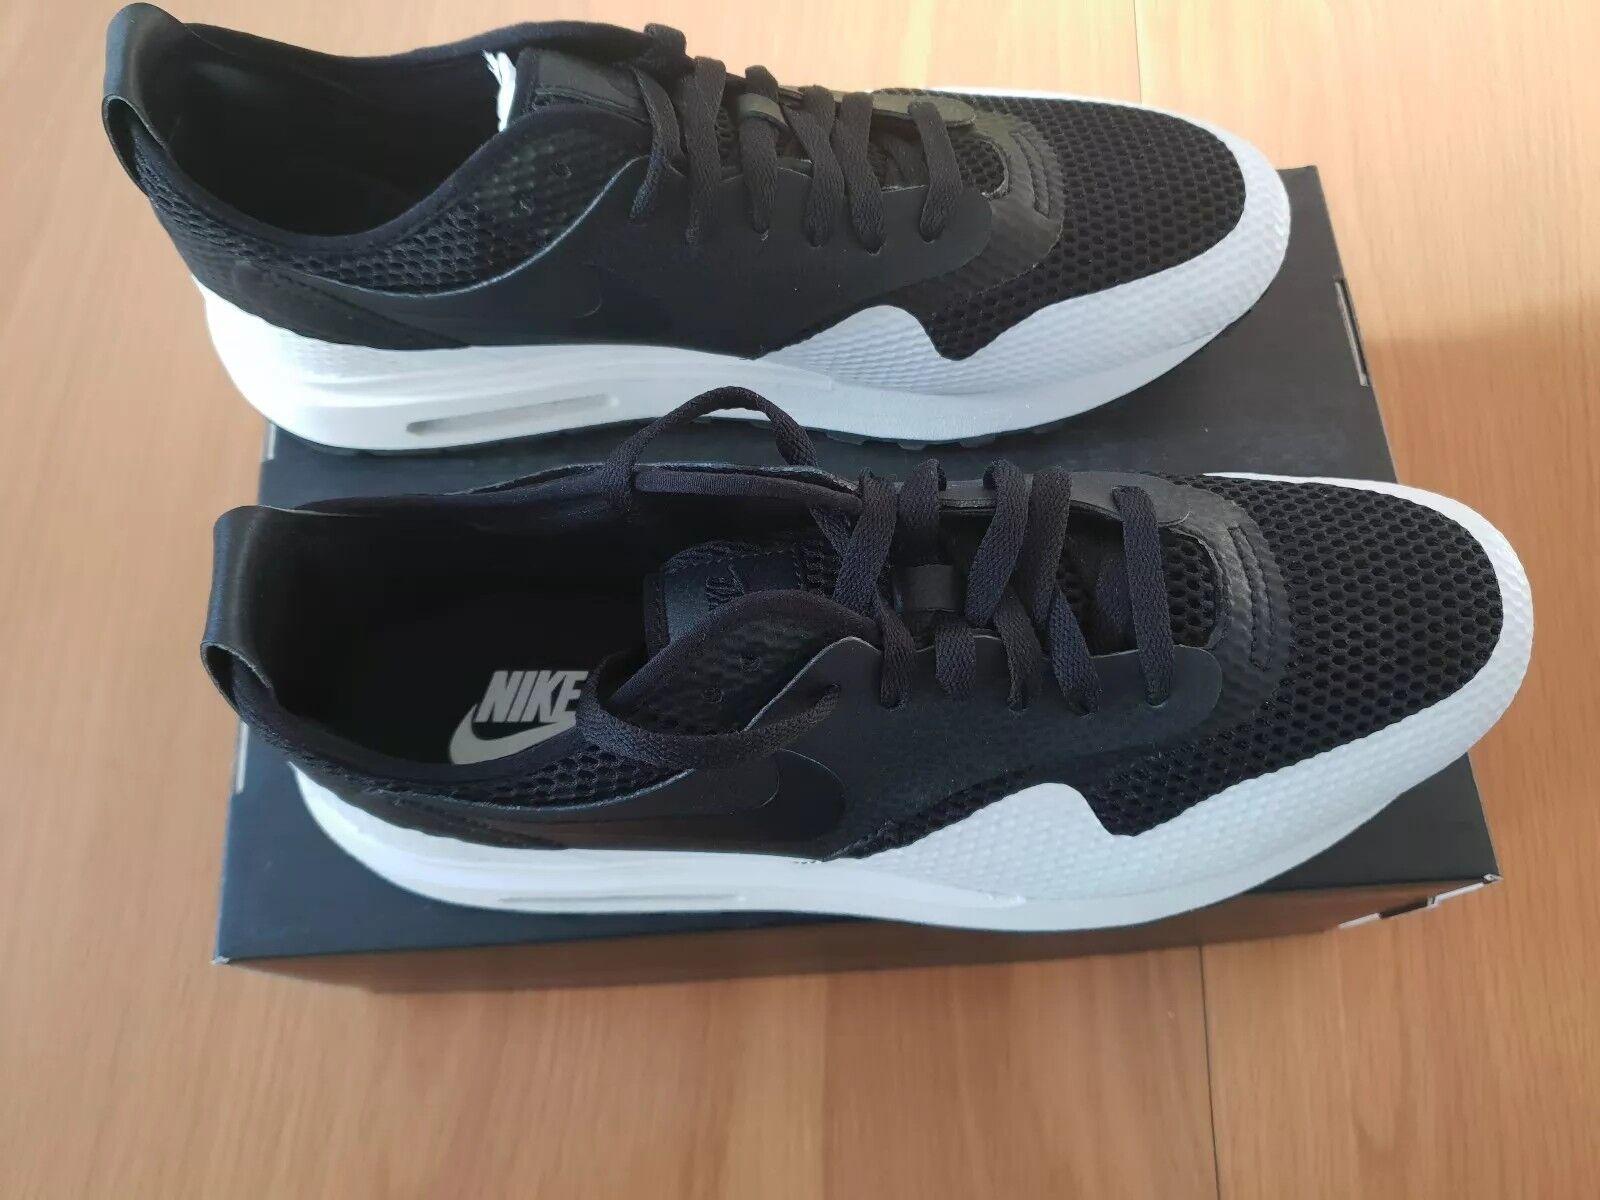 Nike Air Max 1 Royal SE SP Größe 9.5UK